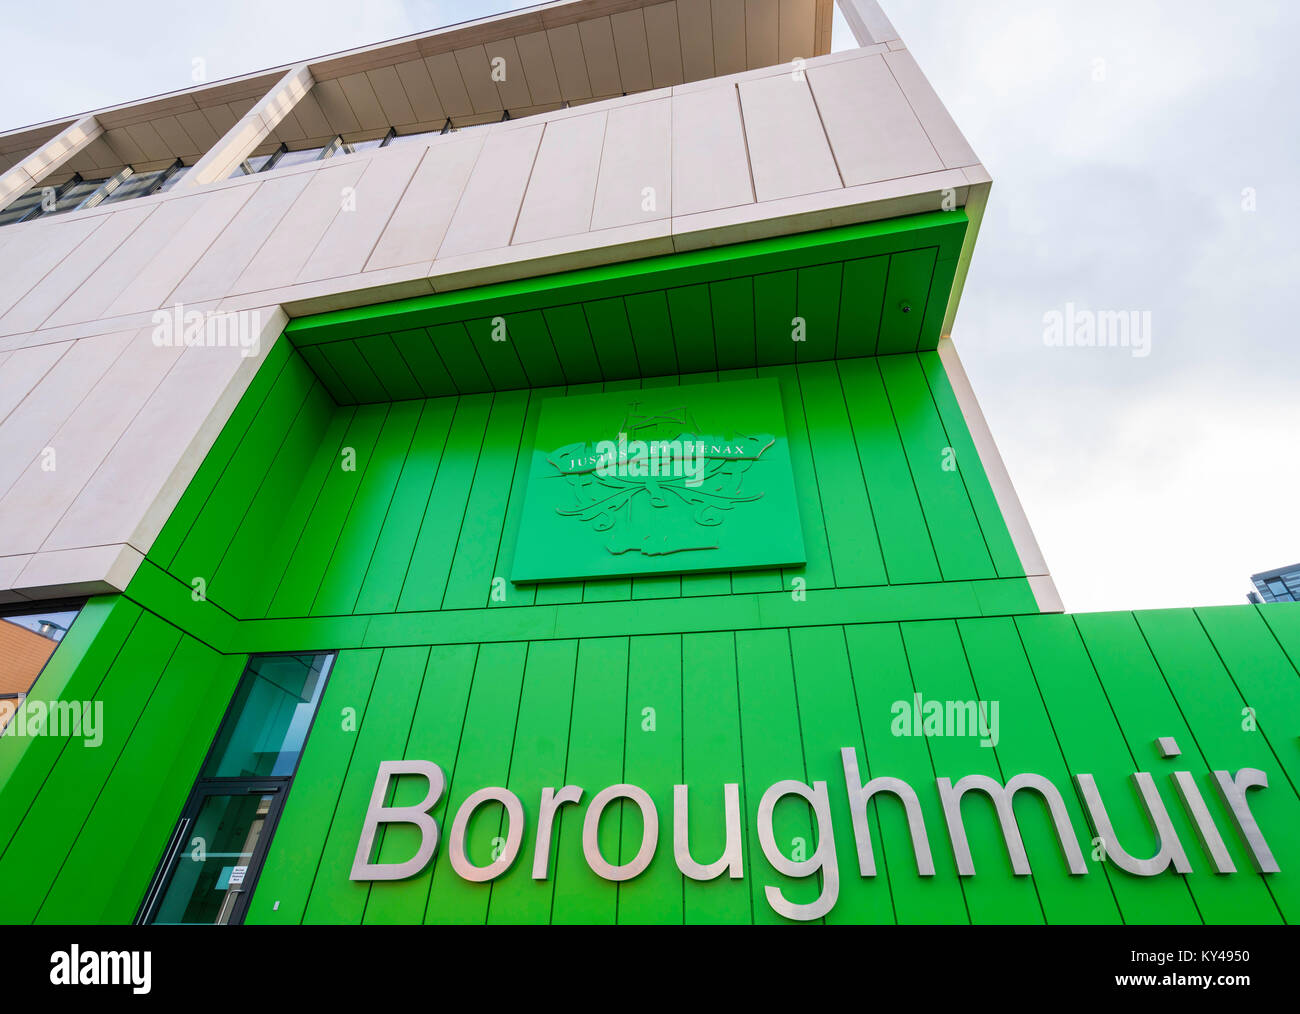 Nuevo completando Boroughmuir High School en Edimburgo, Escocia, Reino Unido. Foto de stock